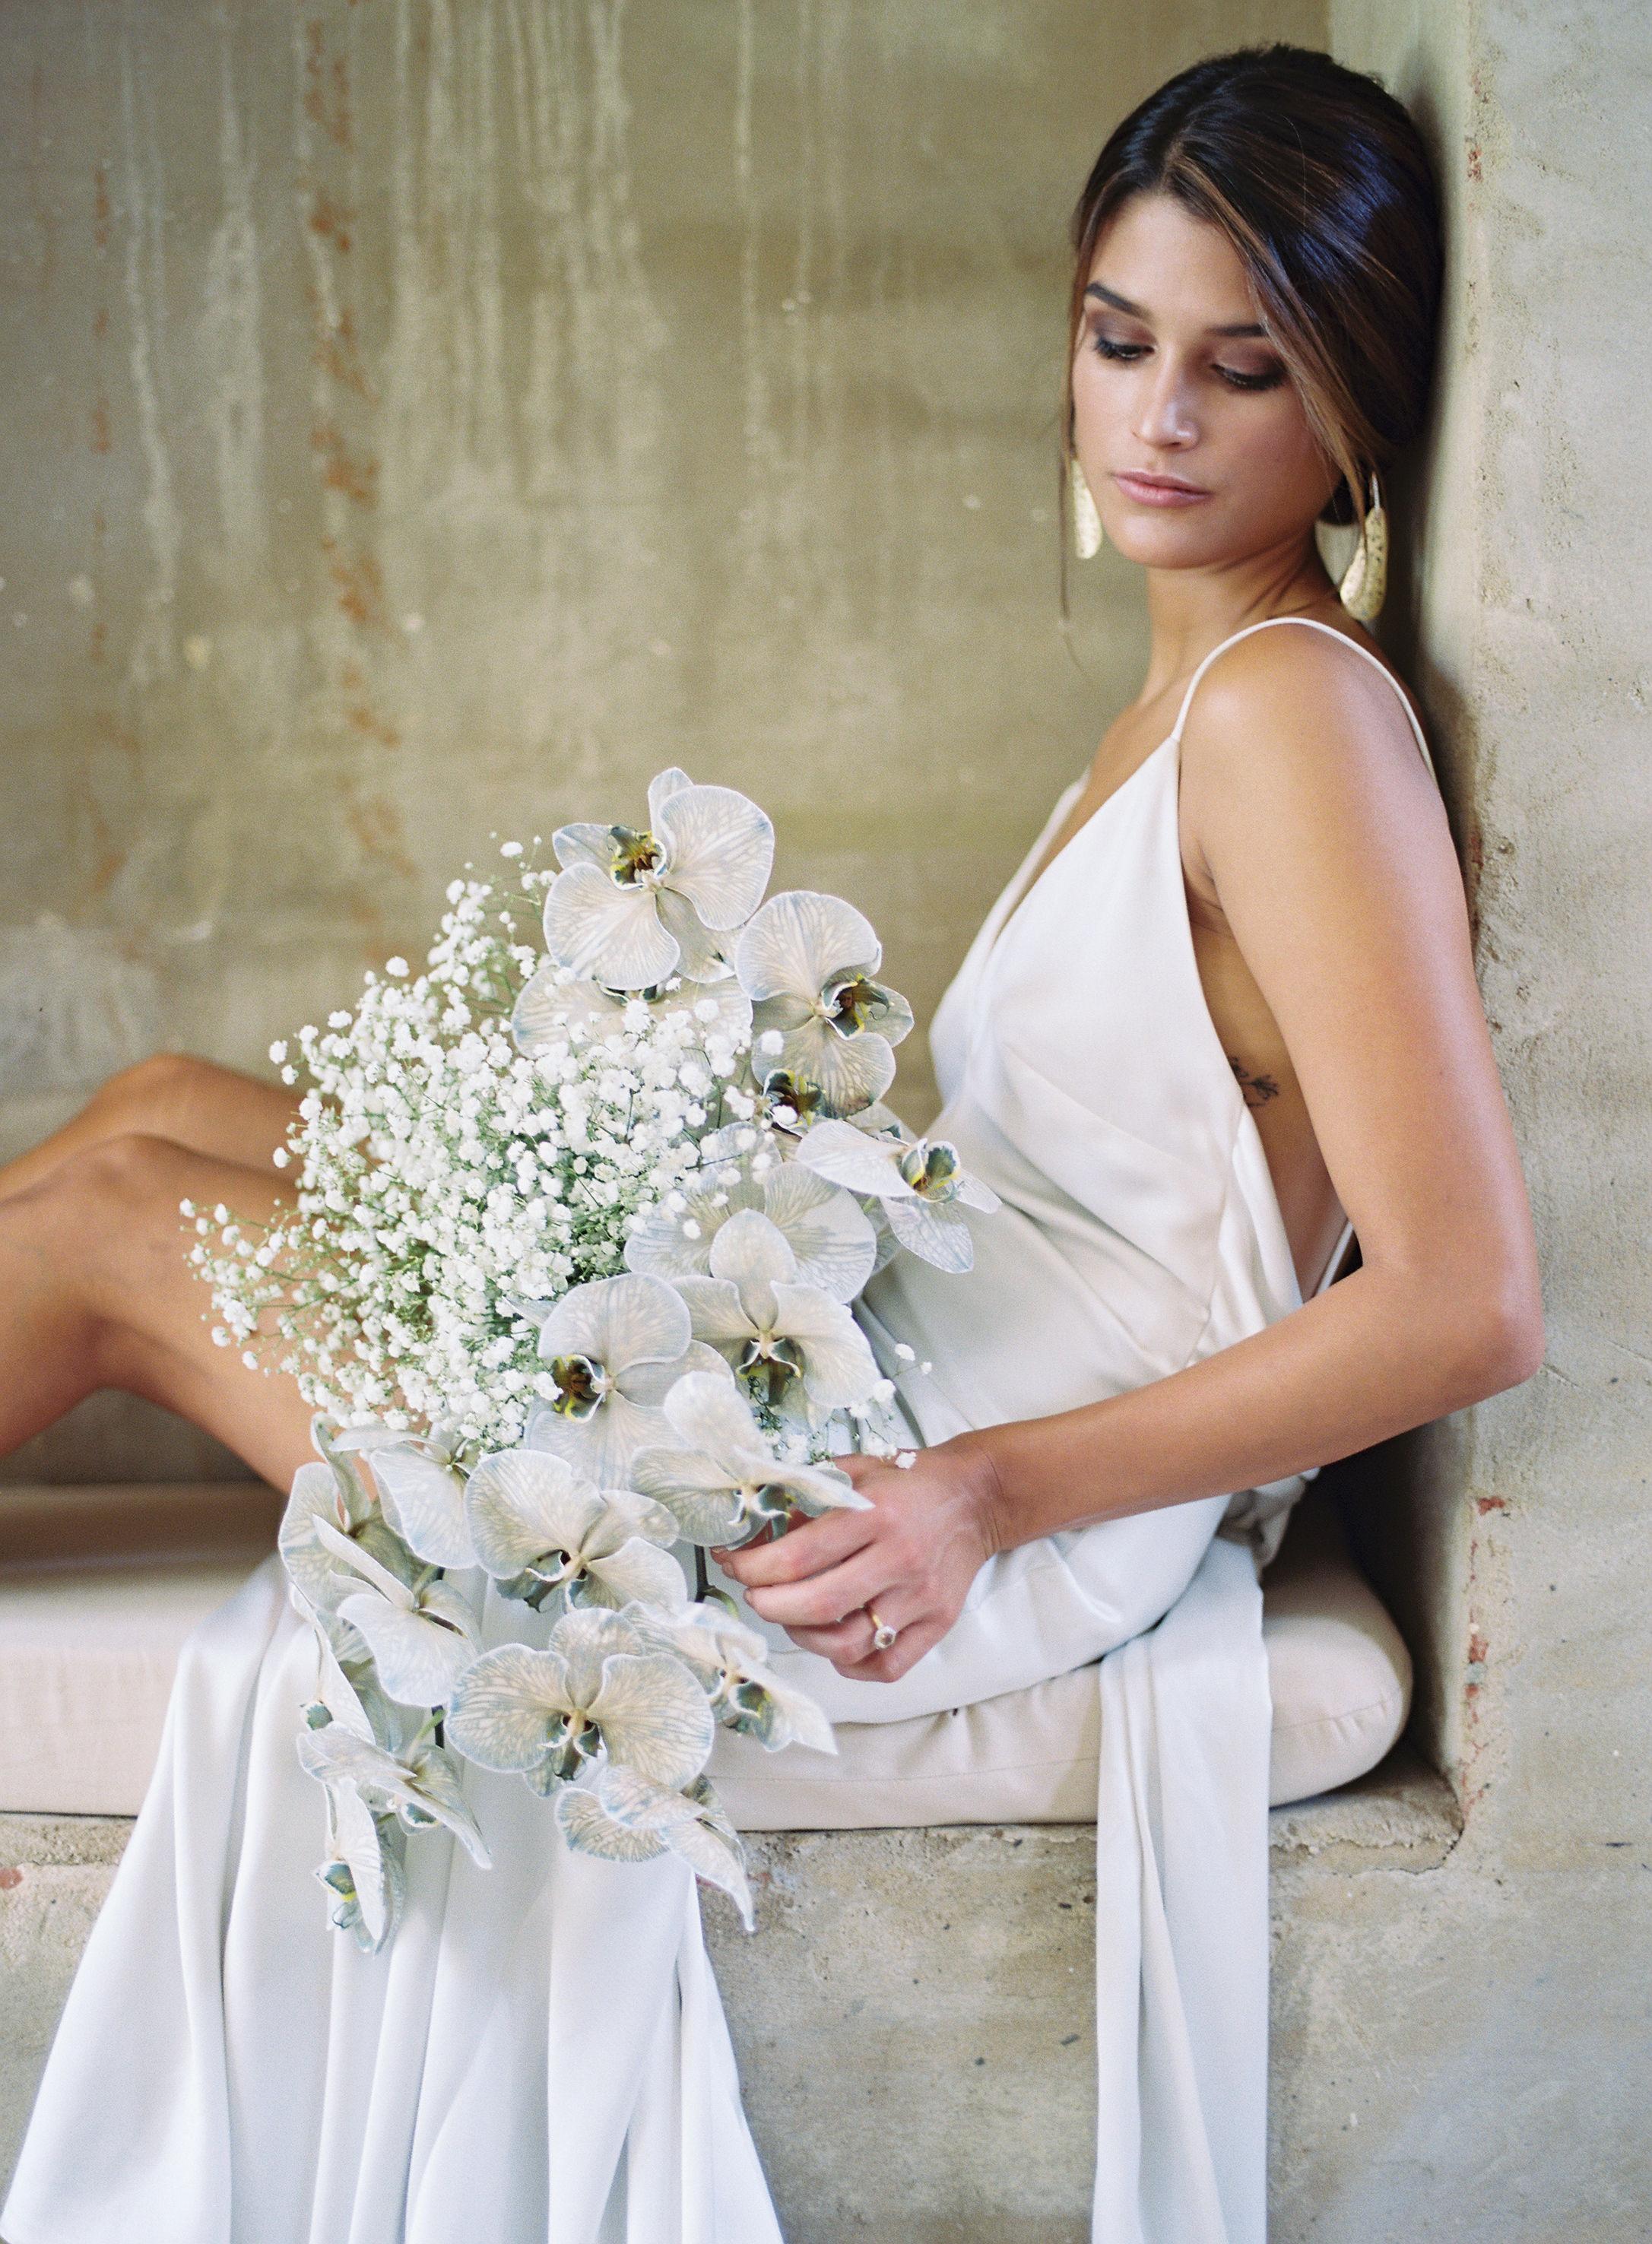 Harpers Bazaar | Bloodwood Botanica orchid bridal bouquet